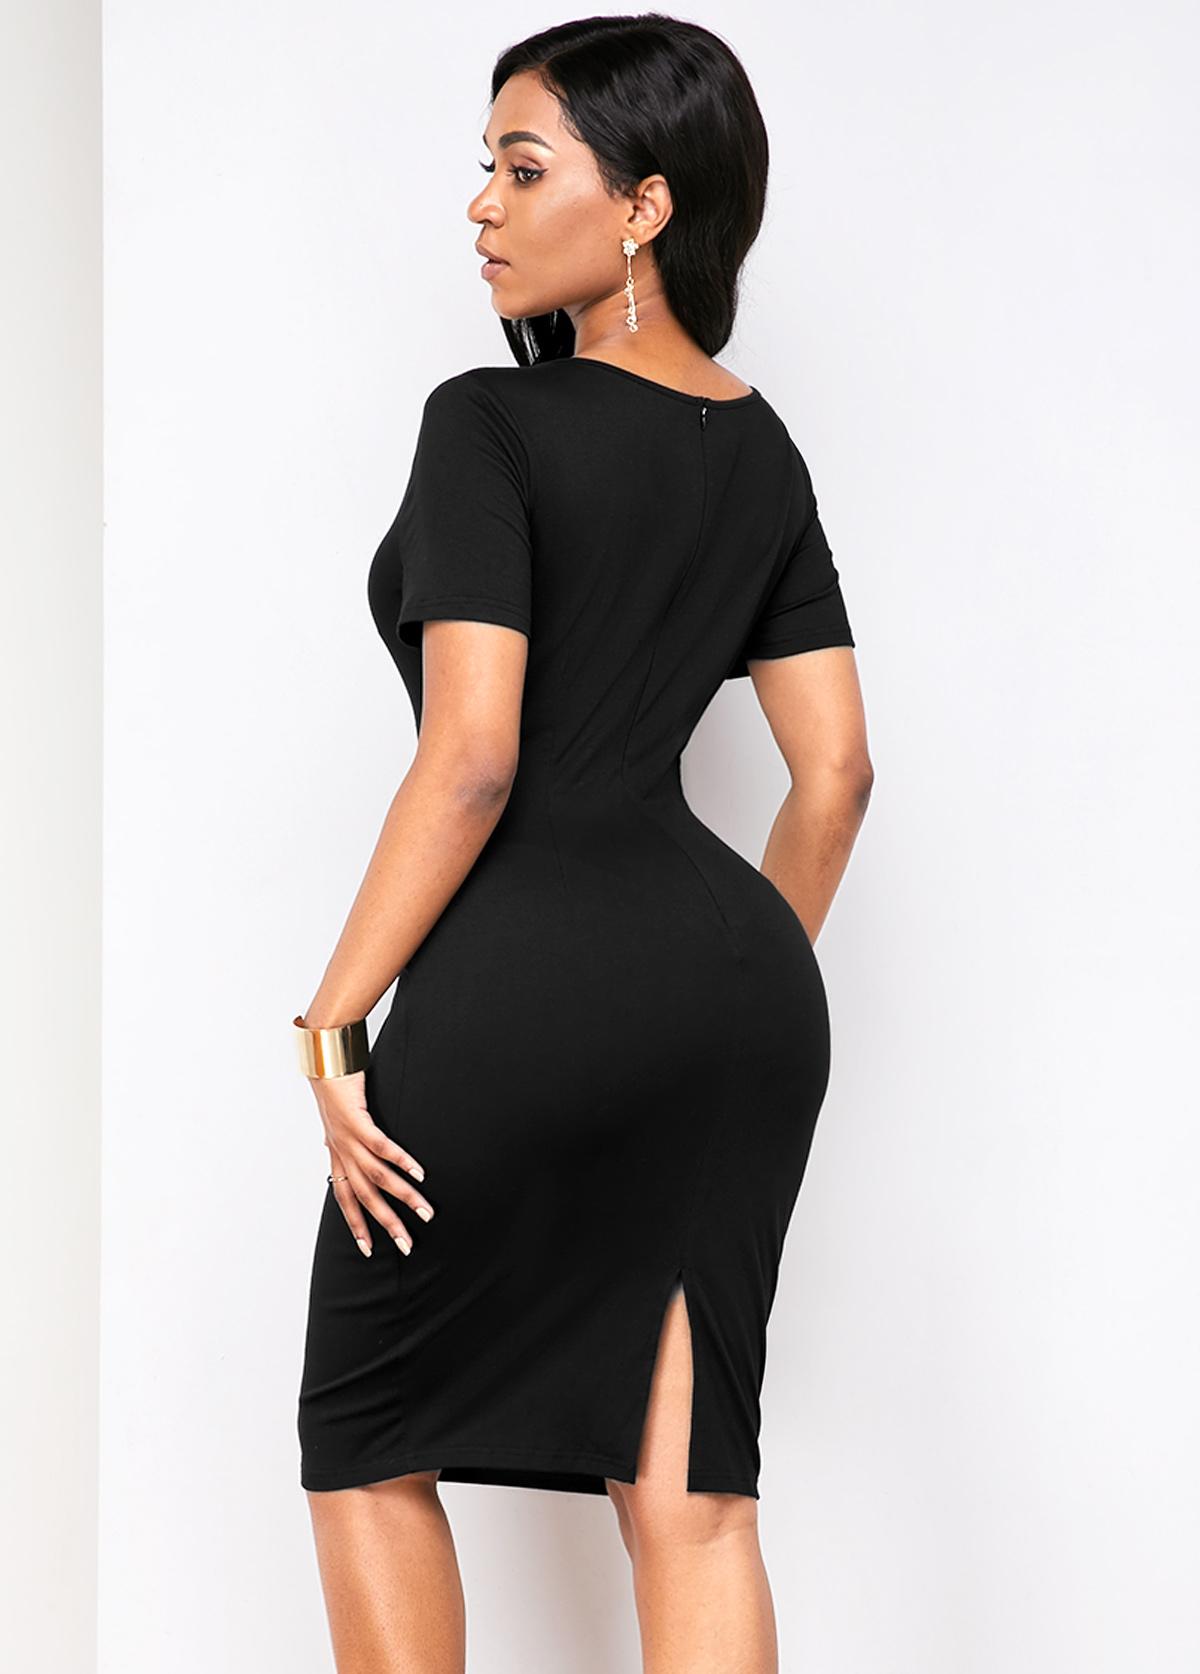 Short Sleeve Back Slit Cutout Front Dress